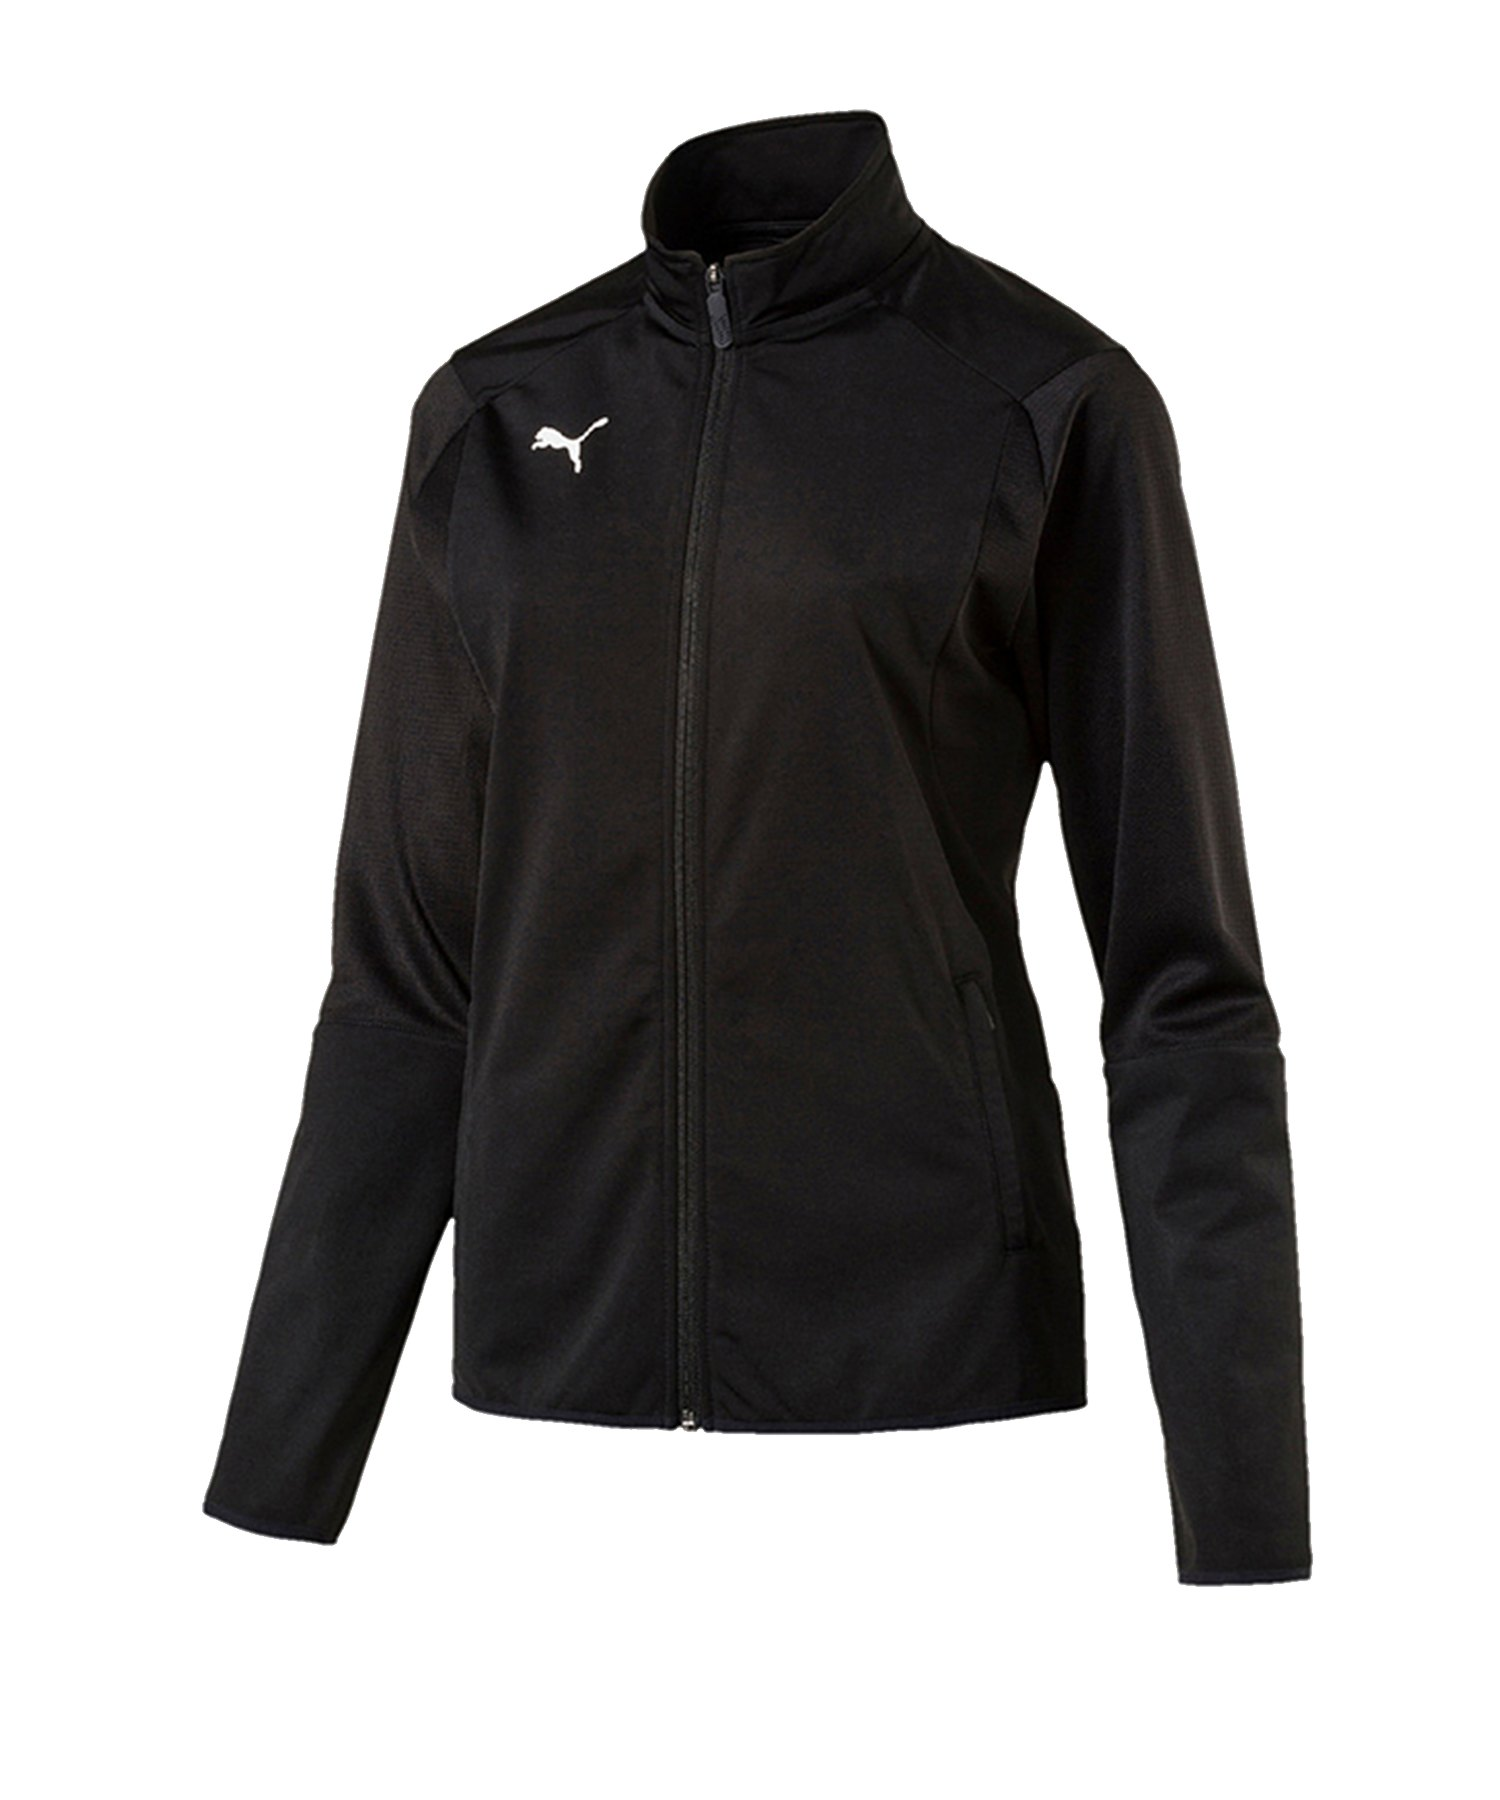 PUMA LIGA Trainingsjacke Damen Schwarz F03 - schwarz